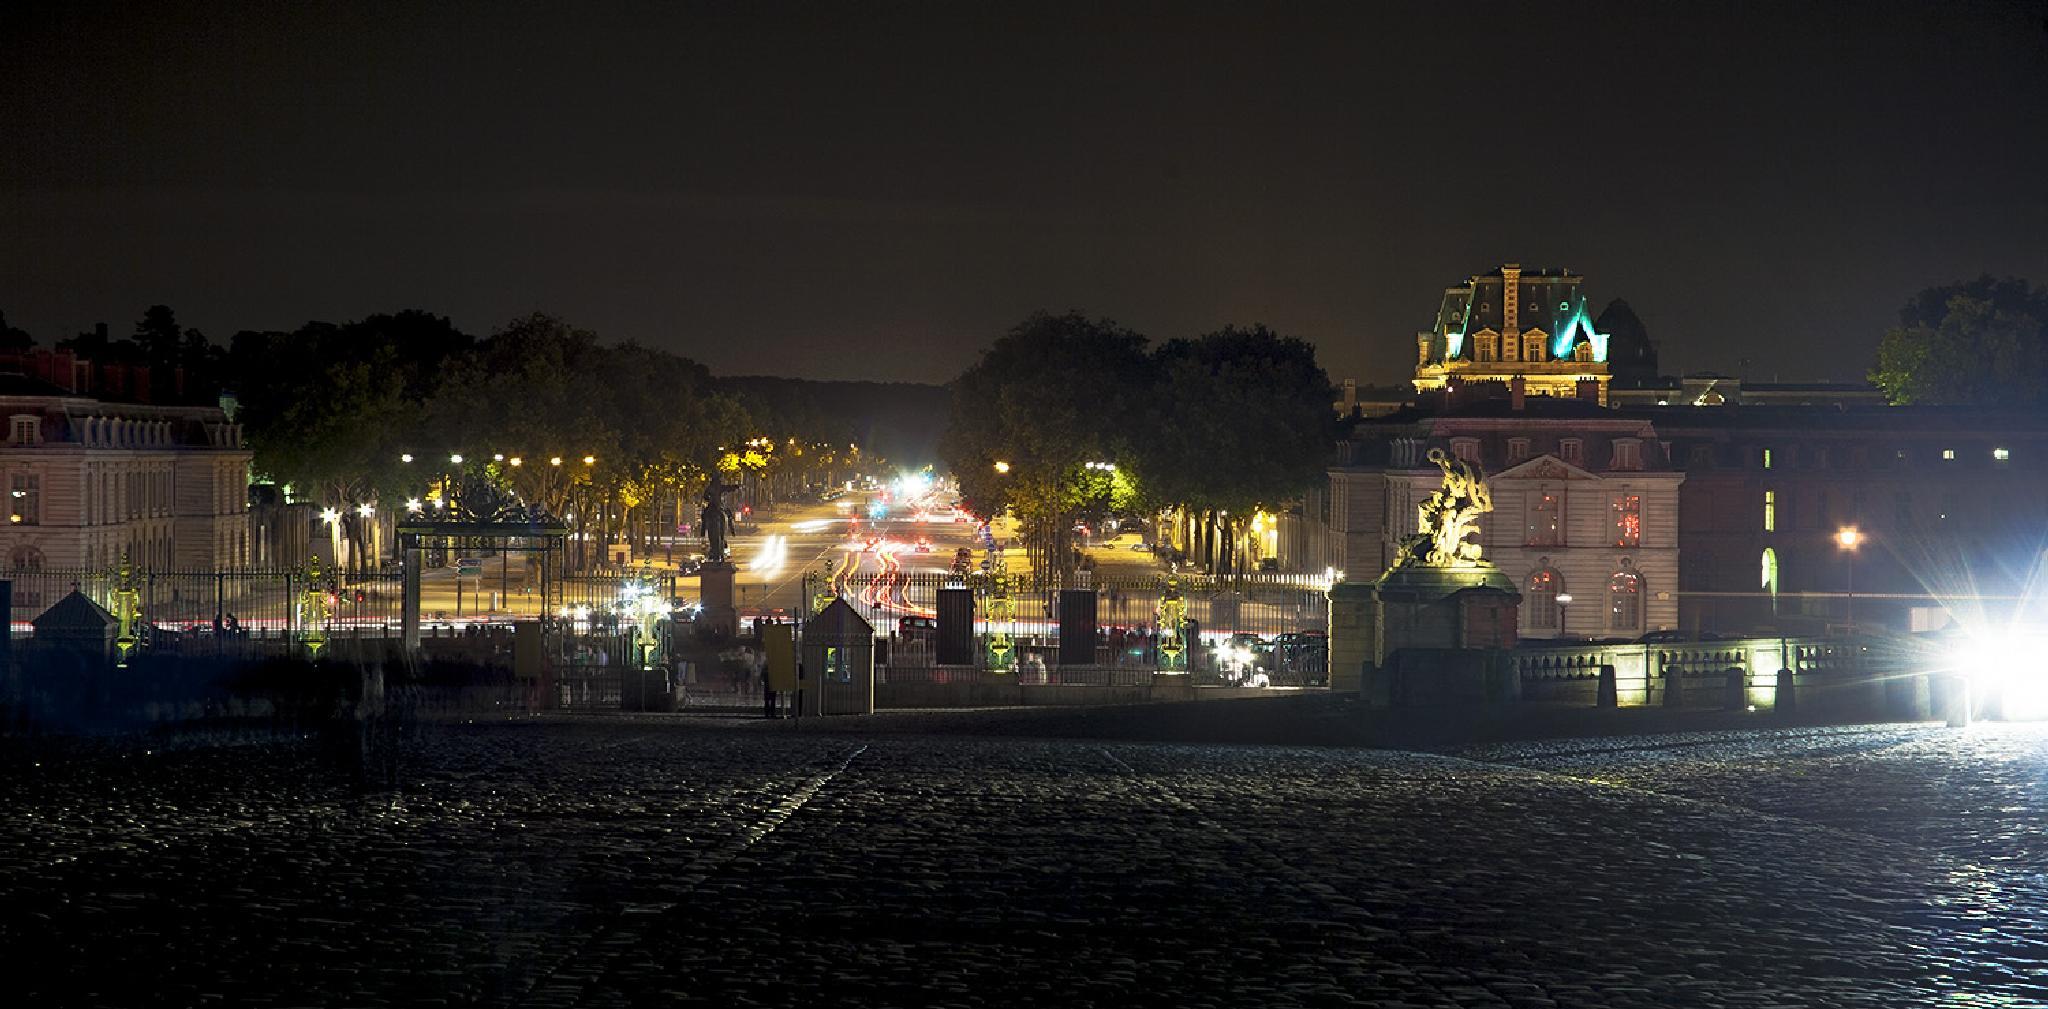 Versailles at Night by harald.seiwert